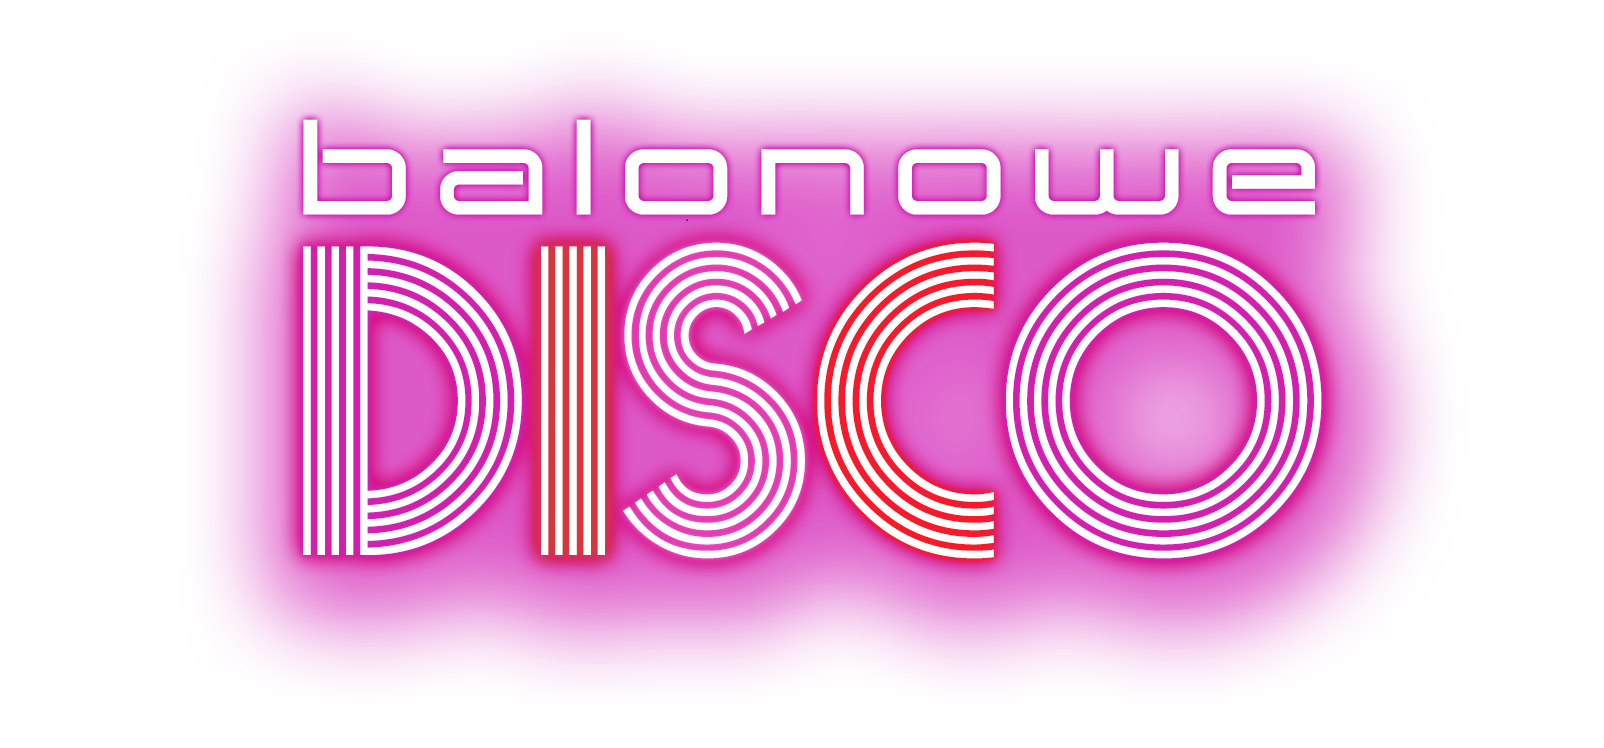 100 disco balonowe